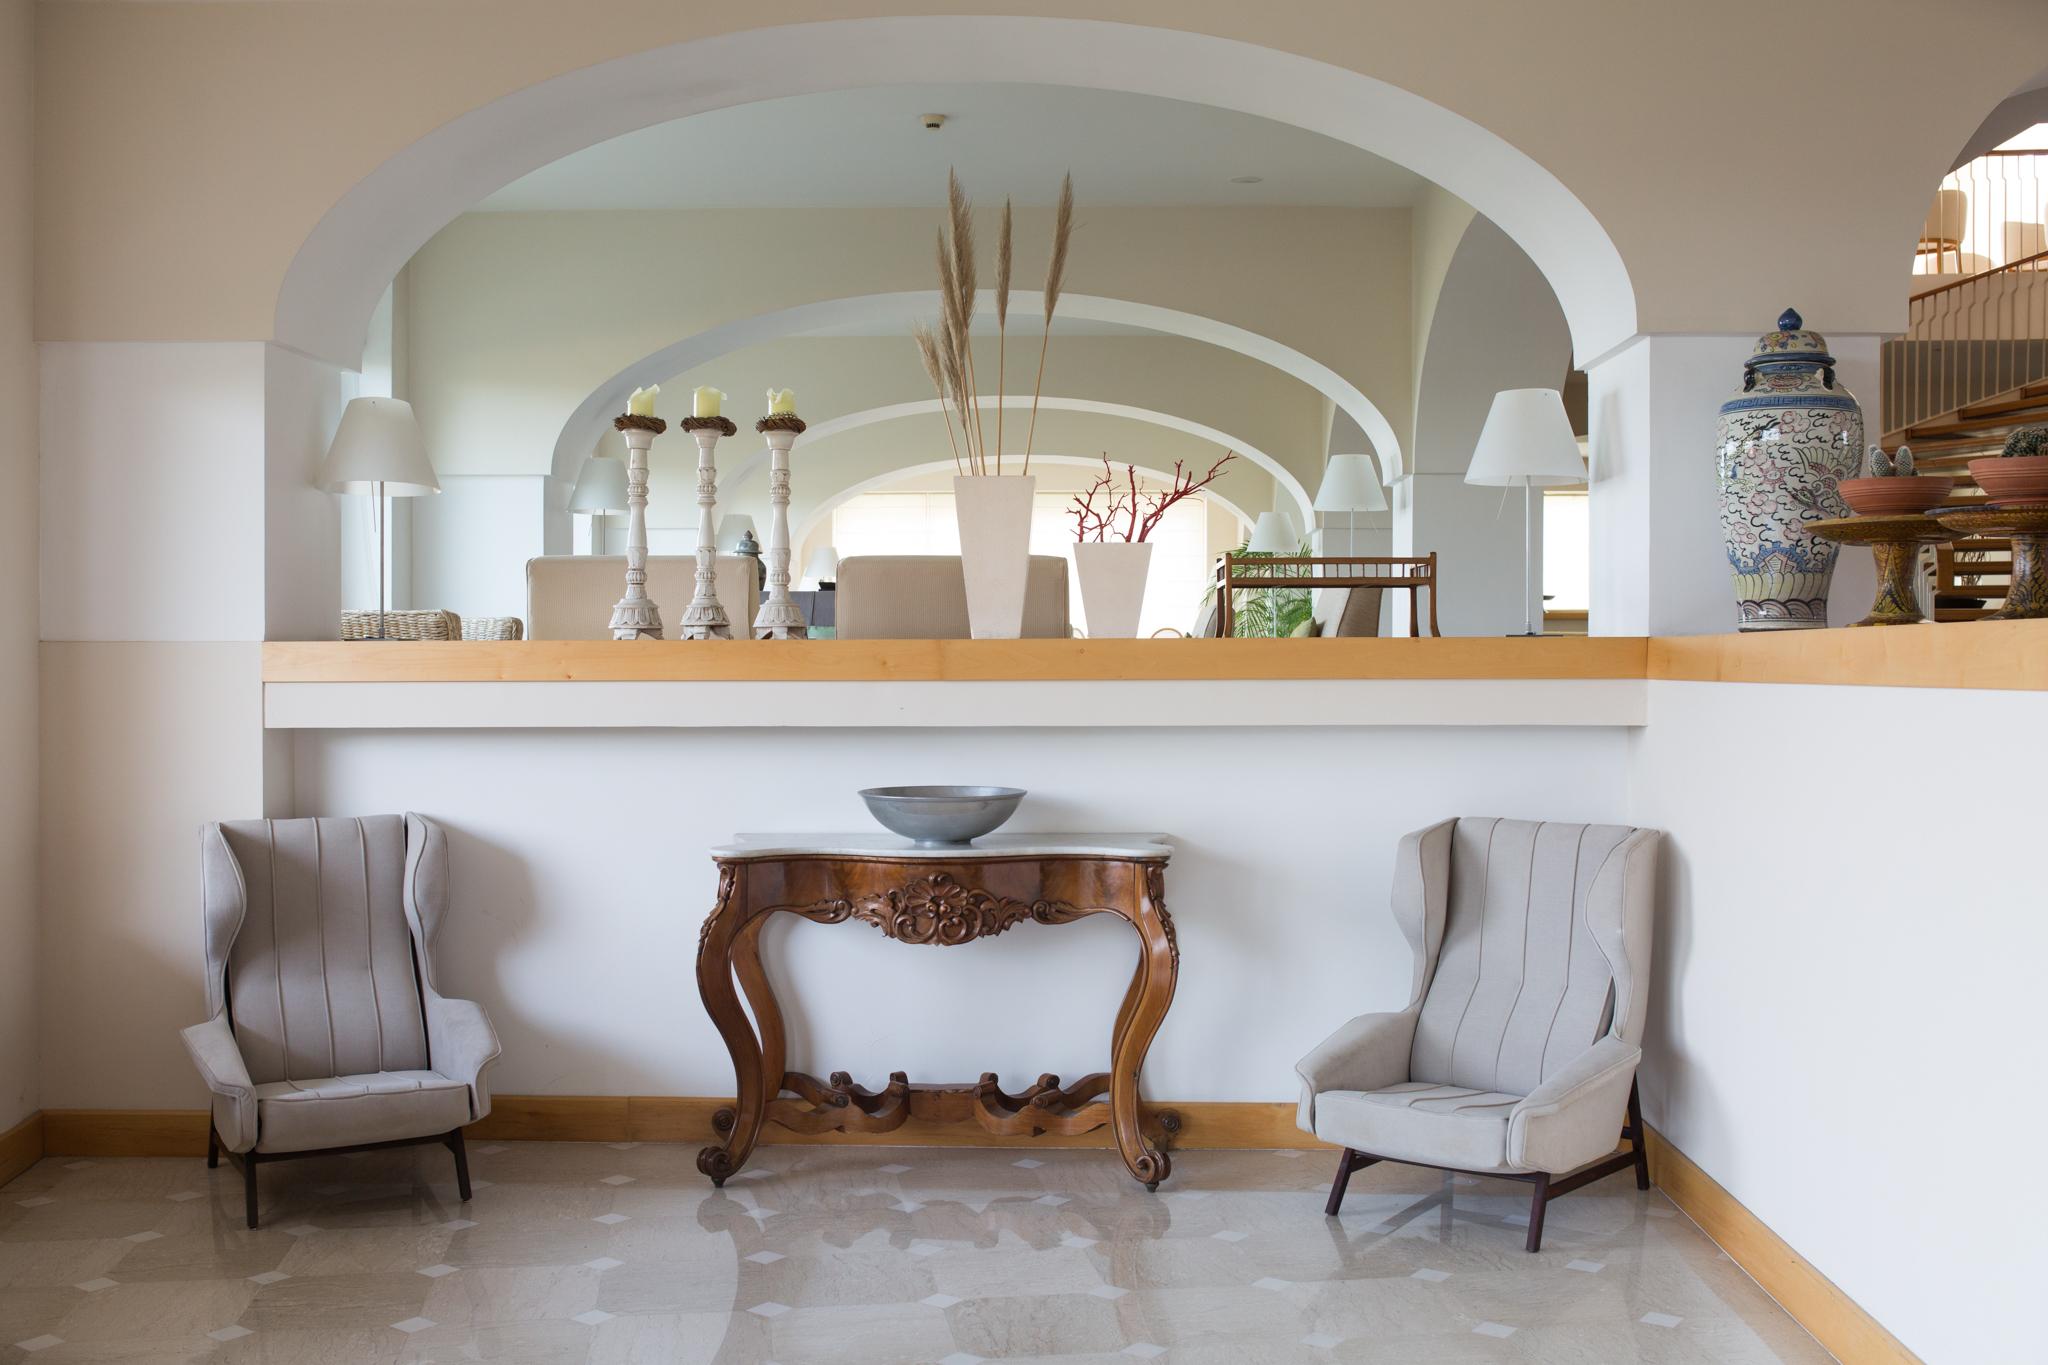 grand hotel aminta-grand hotel aminta sorrento-sorrento hotels-best views in sorrento-dafne restaurant-best sorrento restaurants-alina mendoza-alina mendoza photography-arose travels-8178.jpg